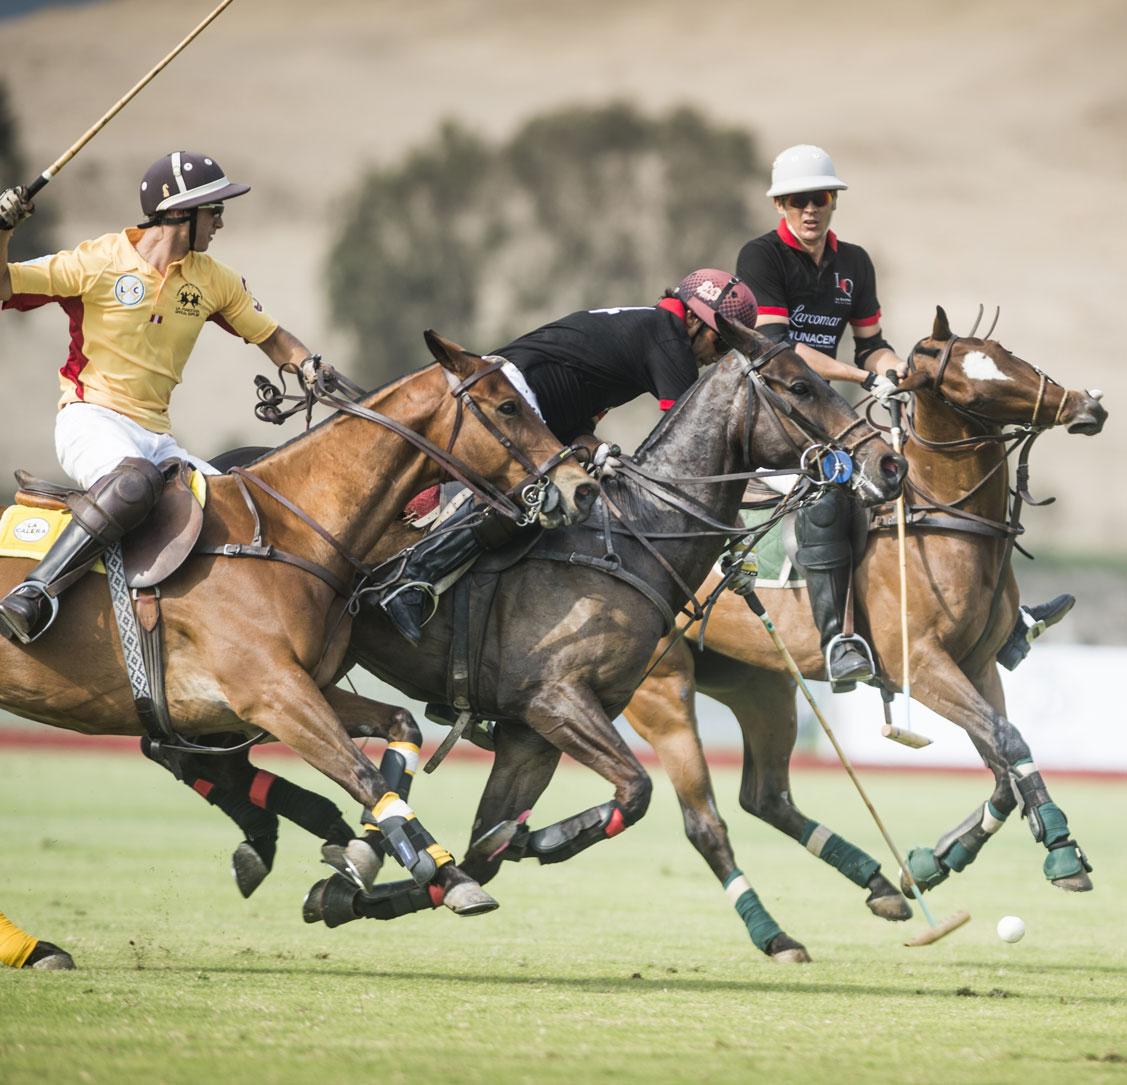 Polo International tournament. Photographs for the Lima Polo Club.